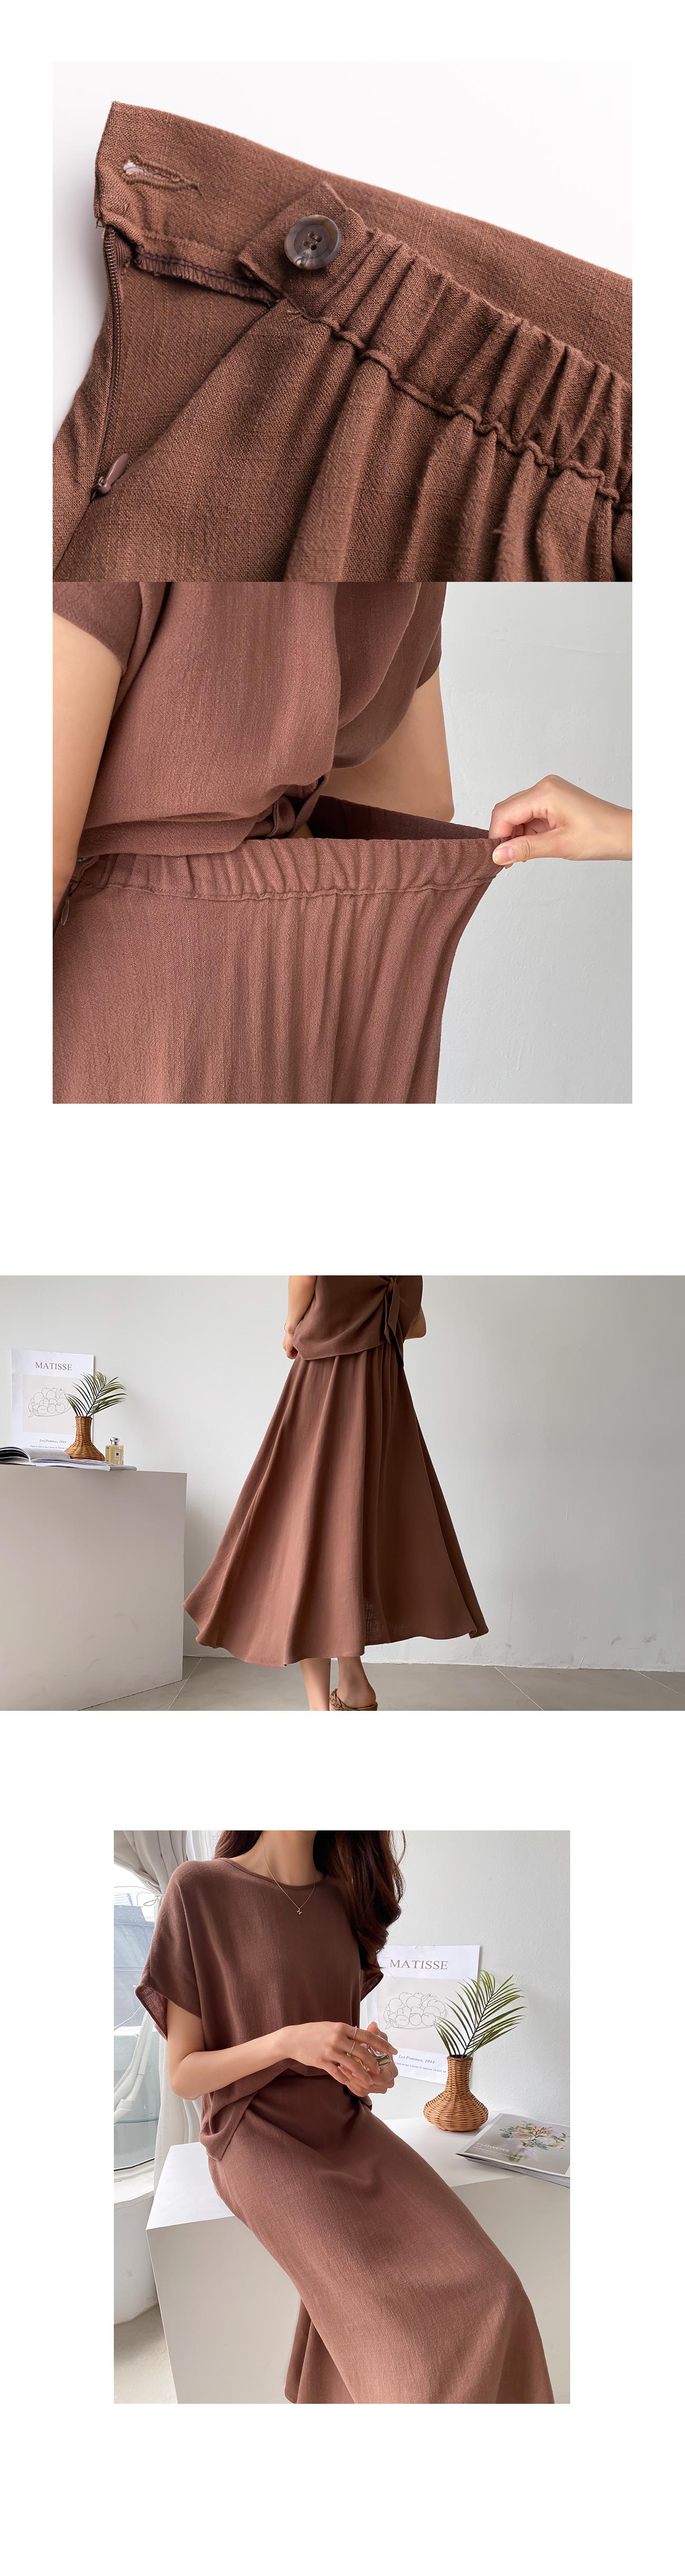 Summer linen twist two piece set #92552